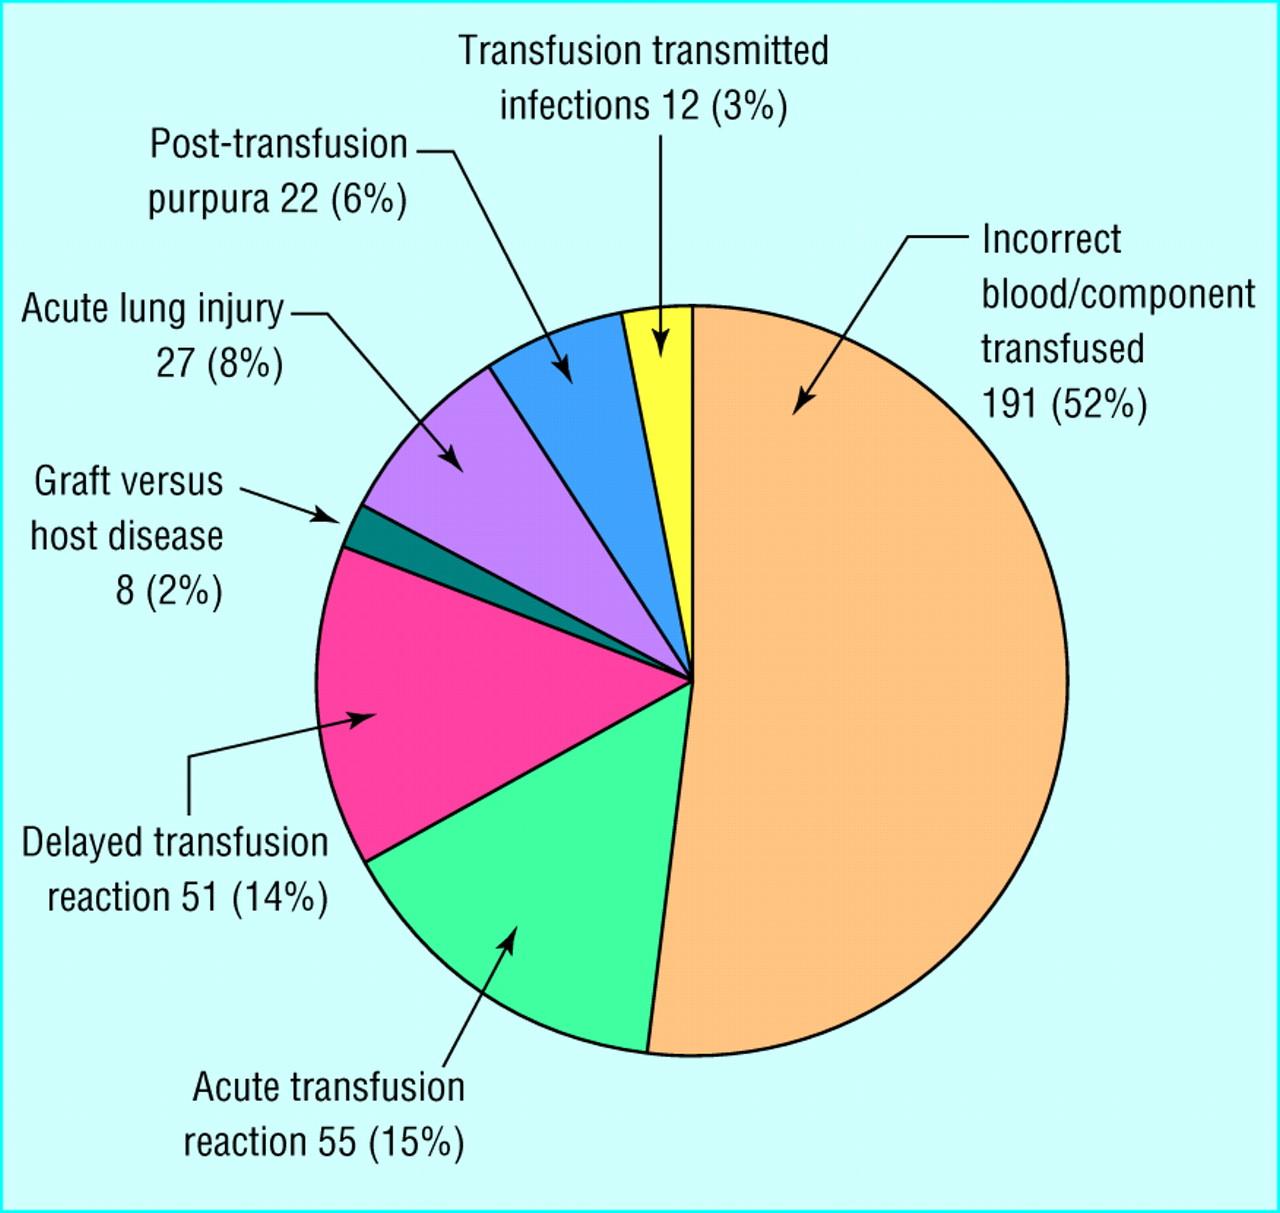 Serious hazards of transfusion (SHOT) initiative: analysis